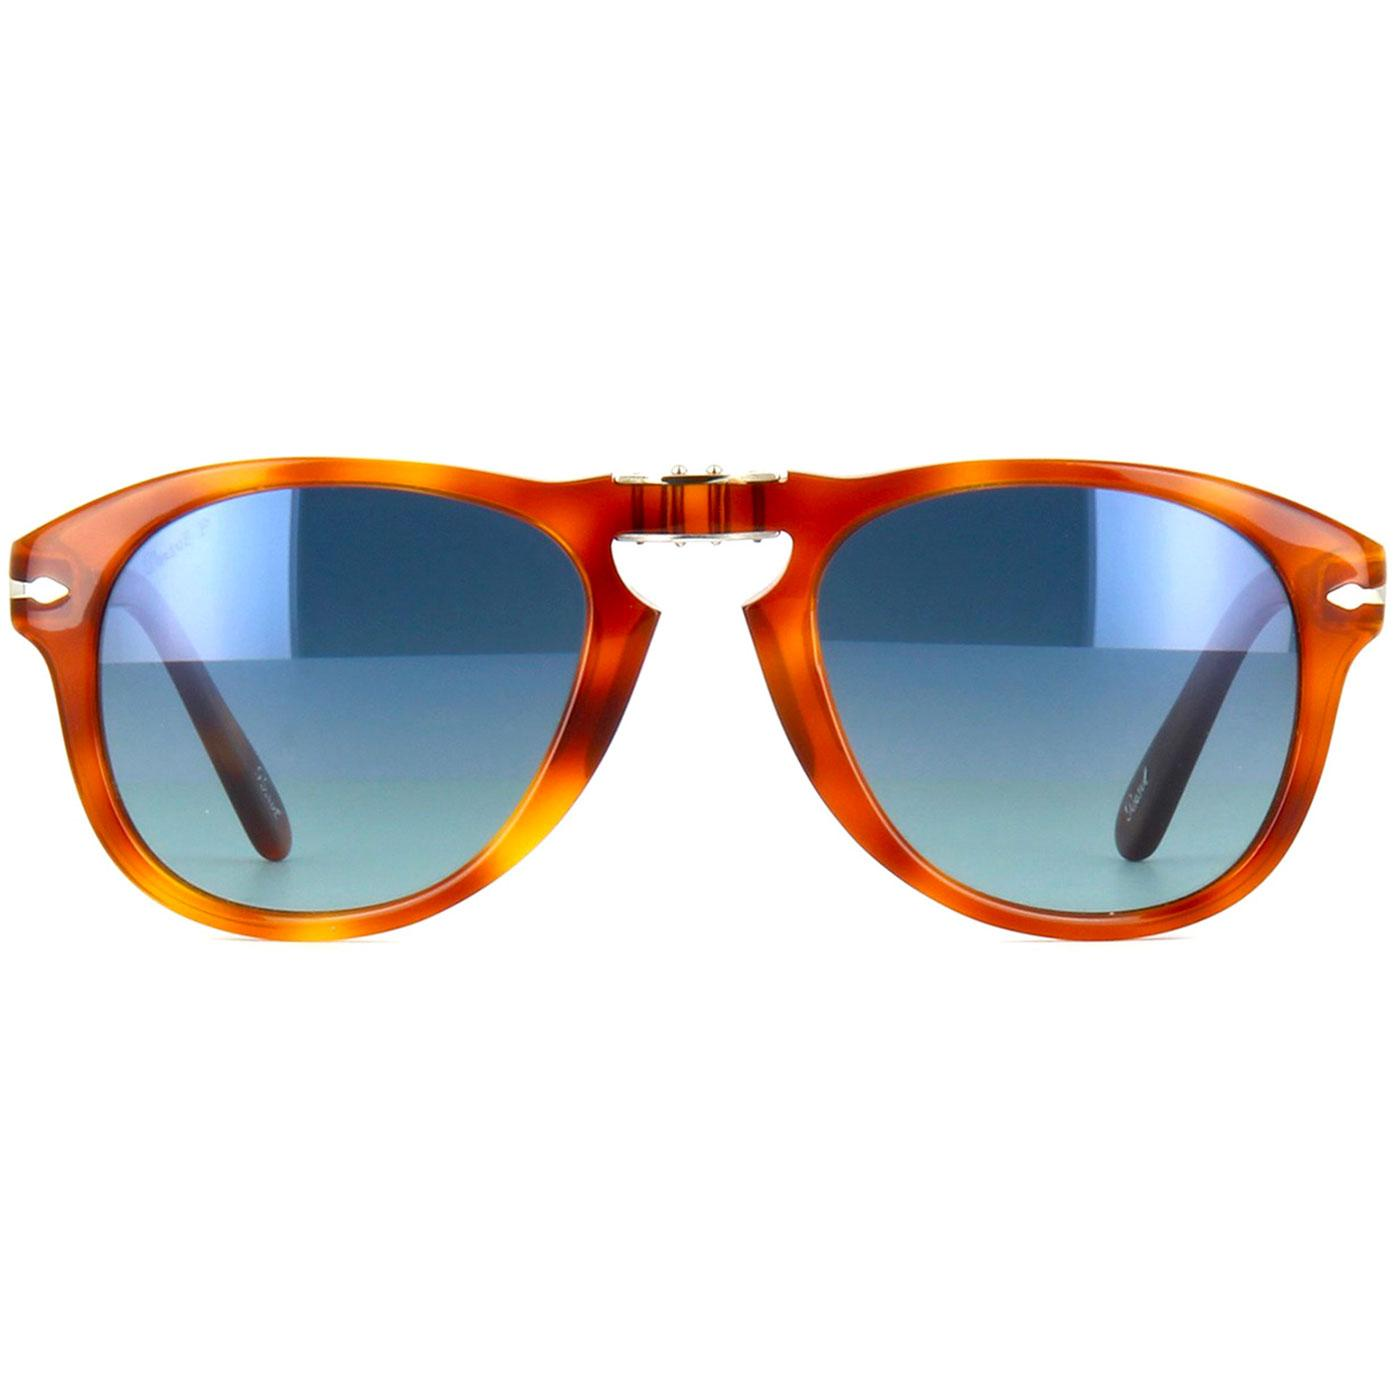 PERSOL Steve McQueen 714SM Sunglasses LIGHT HAVANA